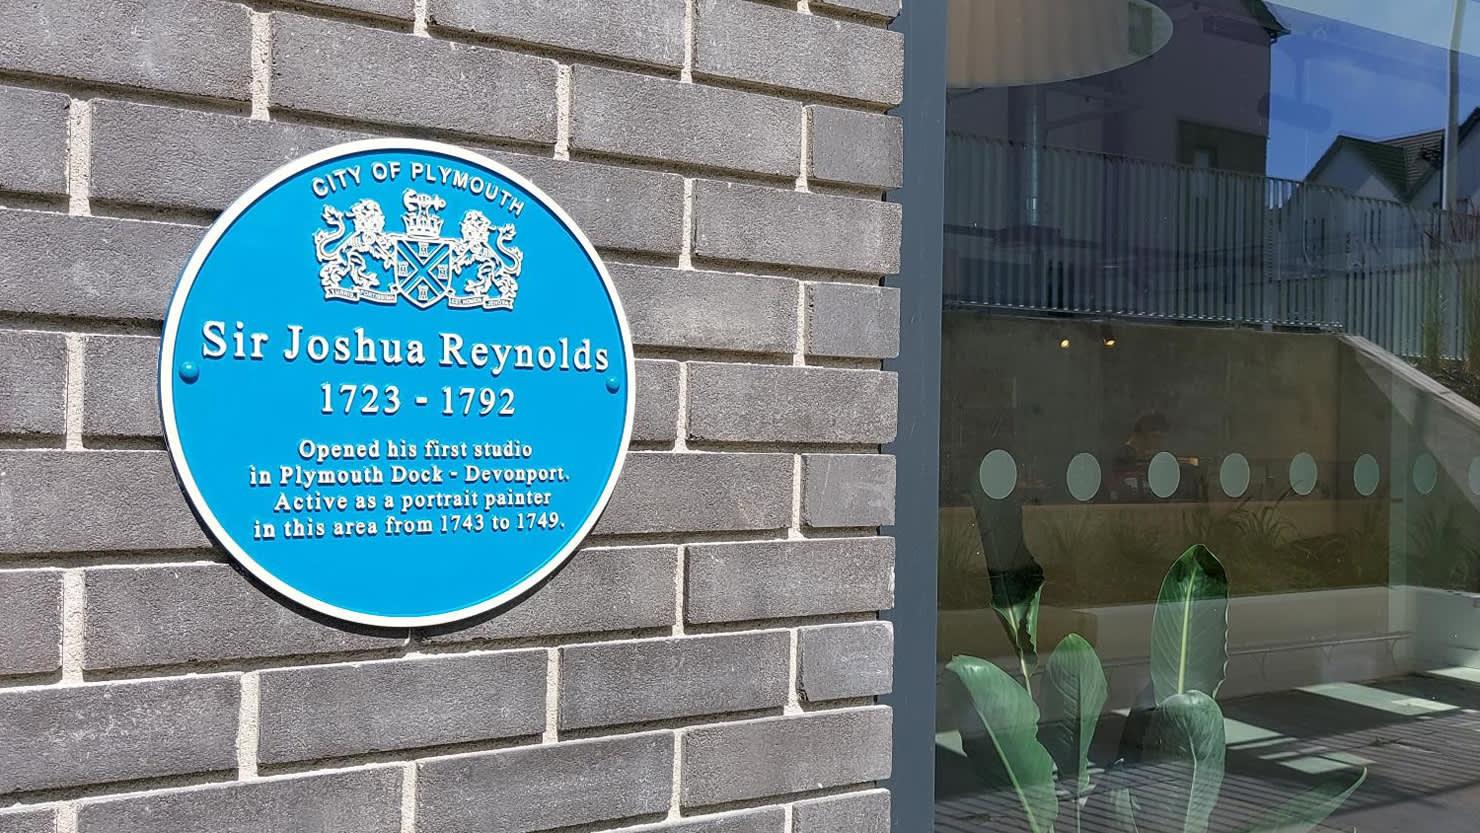 New blue plaque highlights artist's links with Devonport